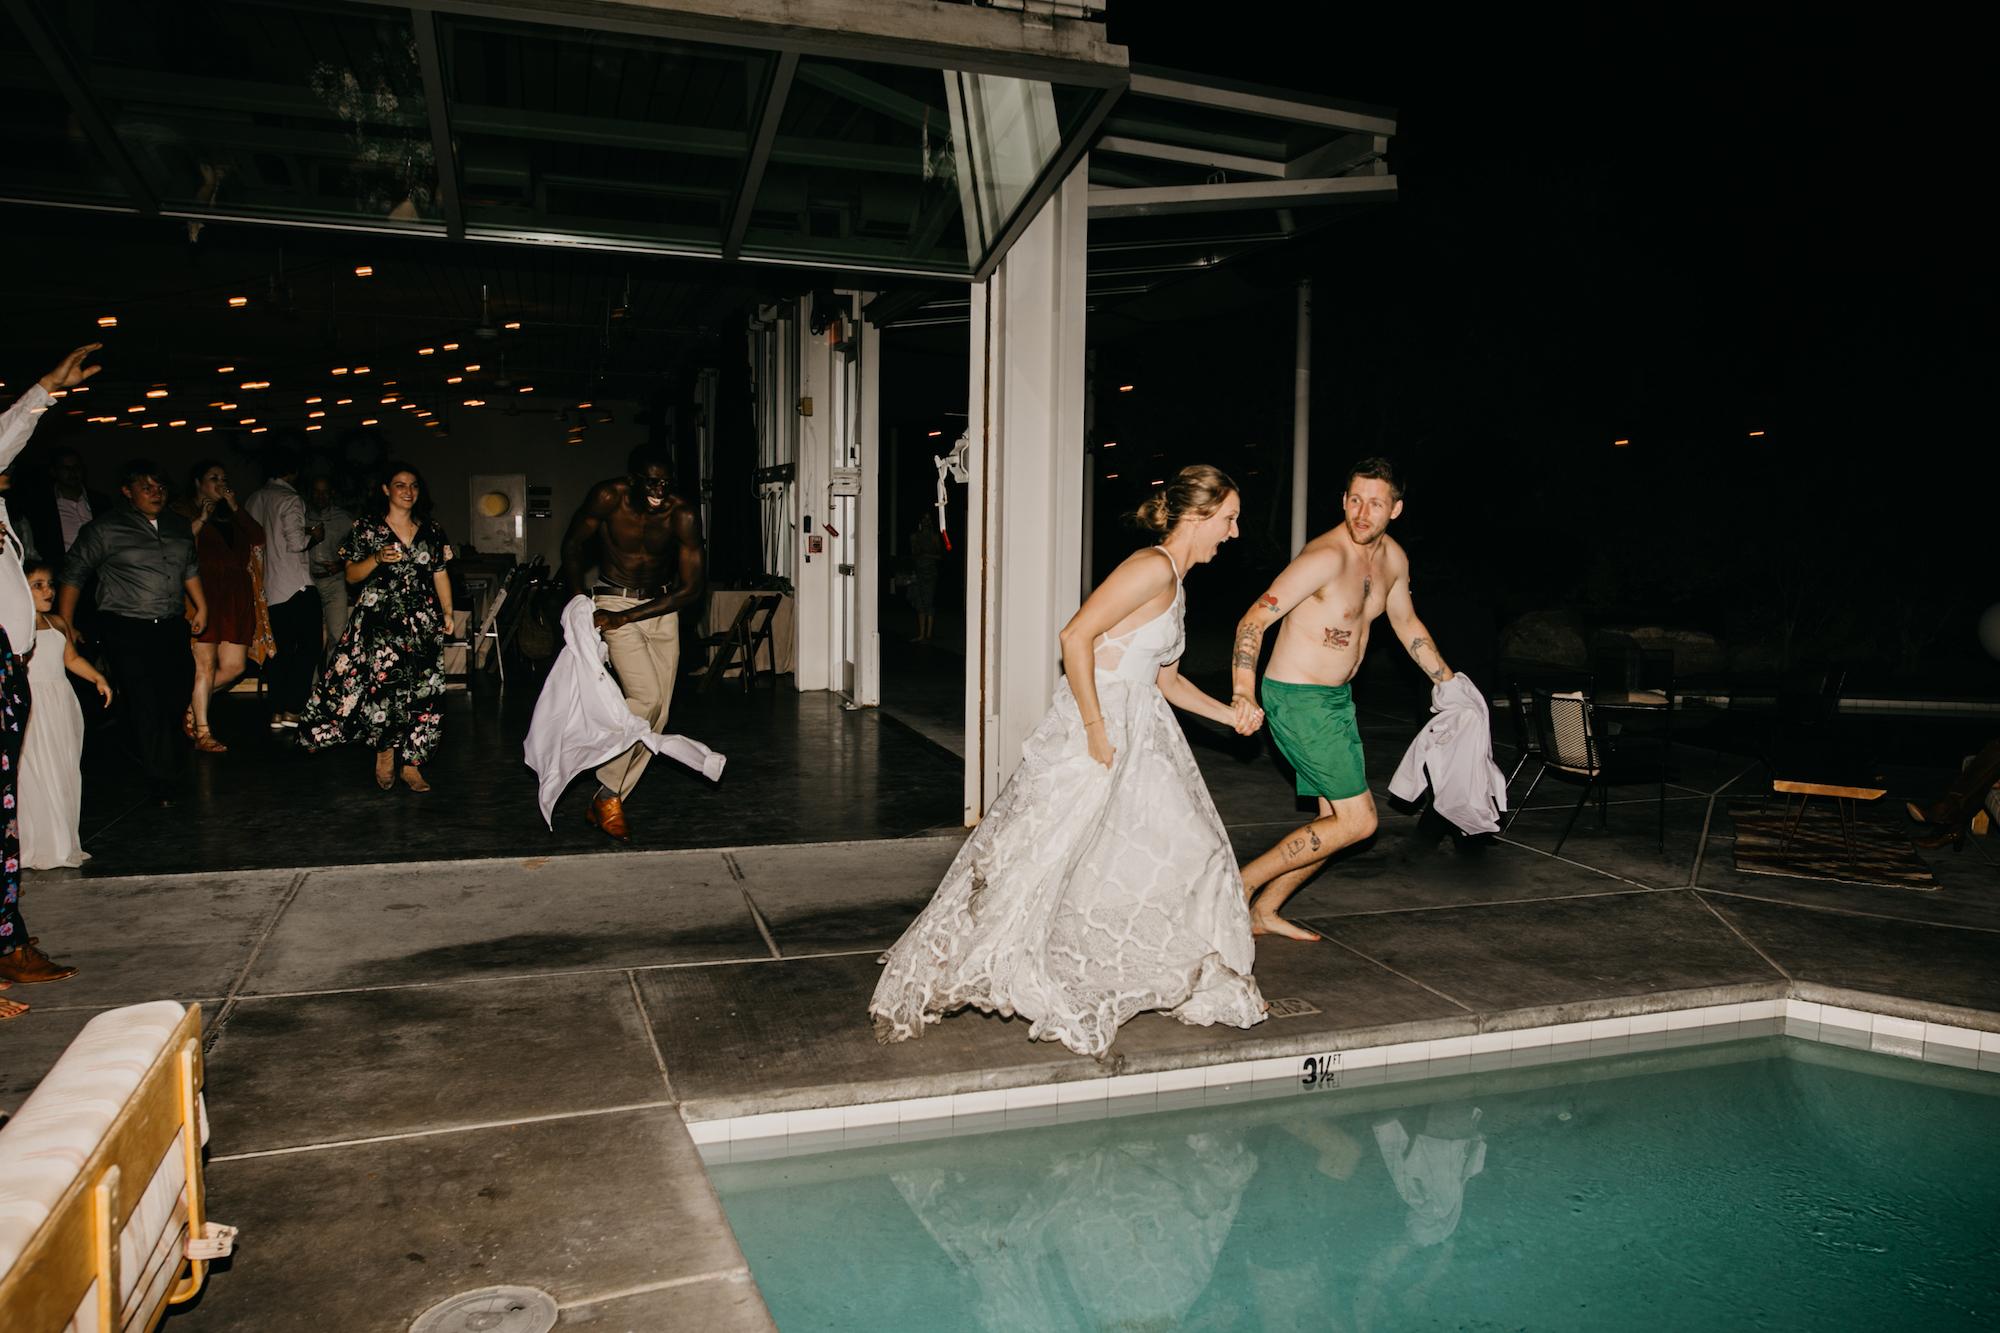 ace-hotel-palm-springs-wedding-photographer923.jpg